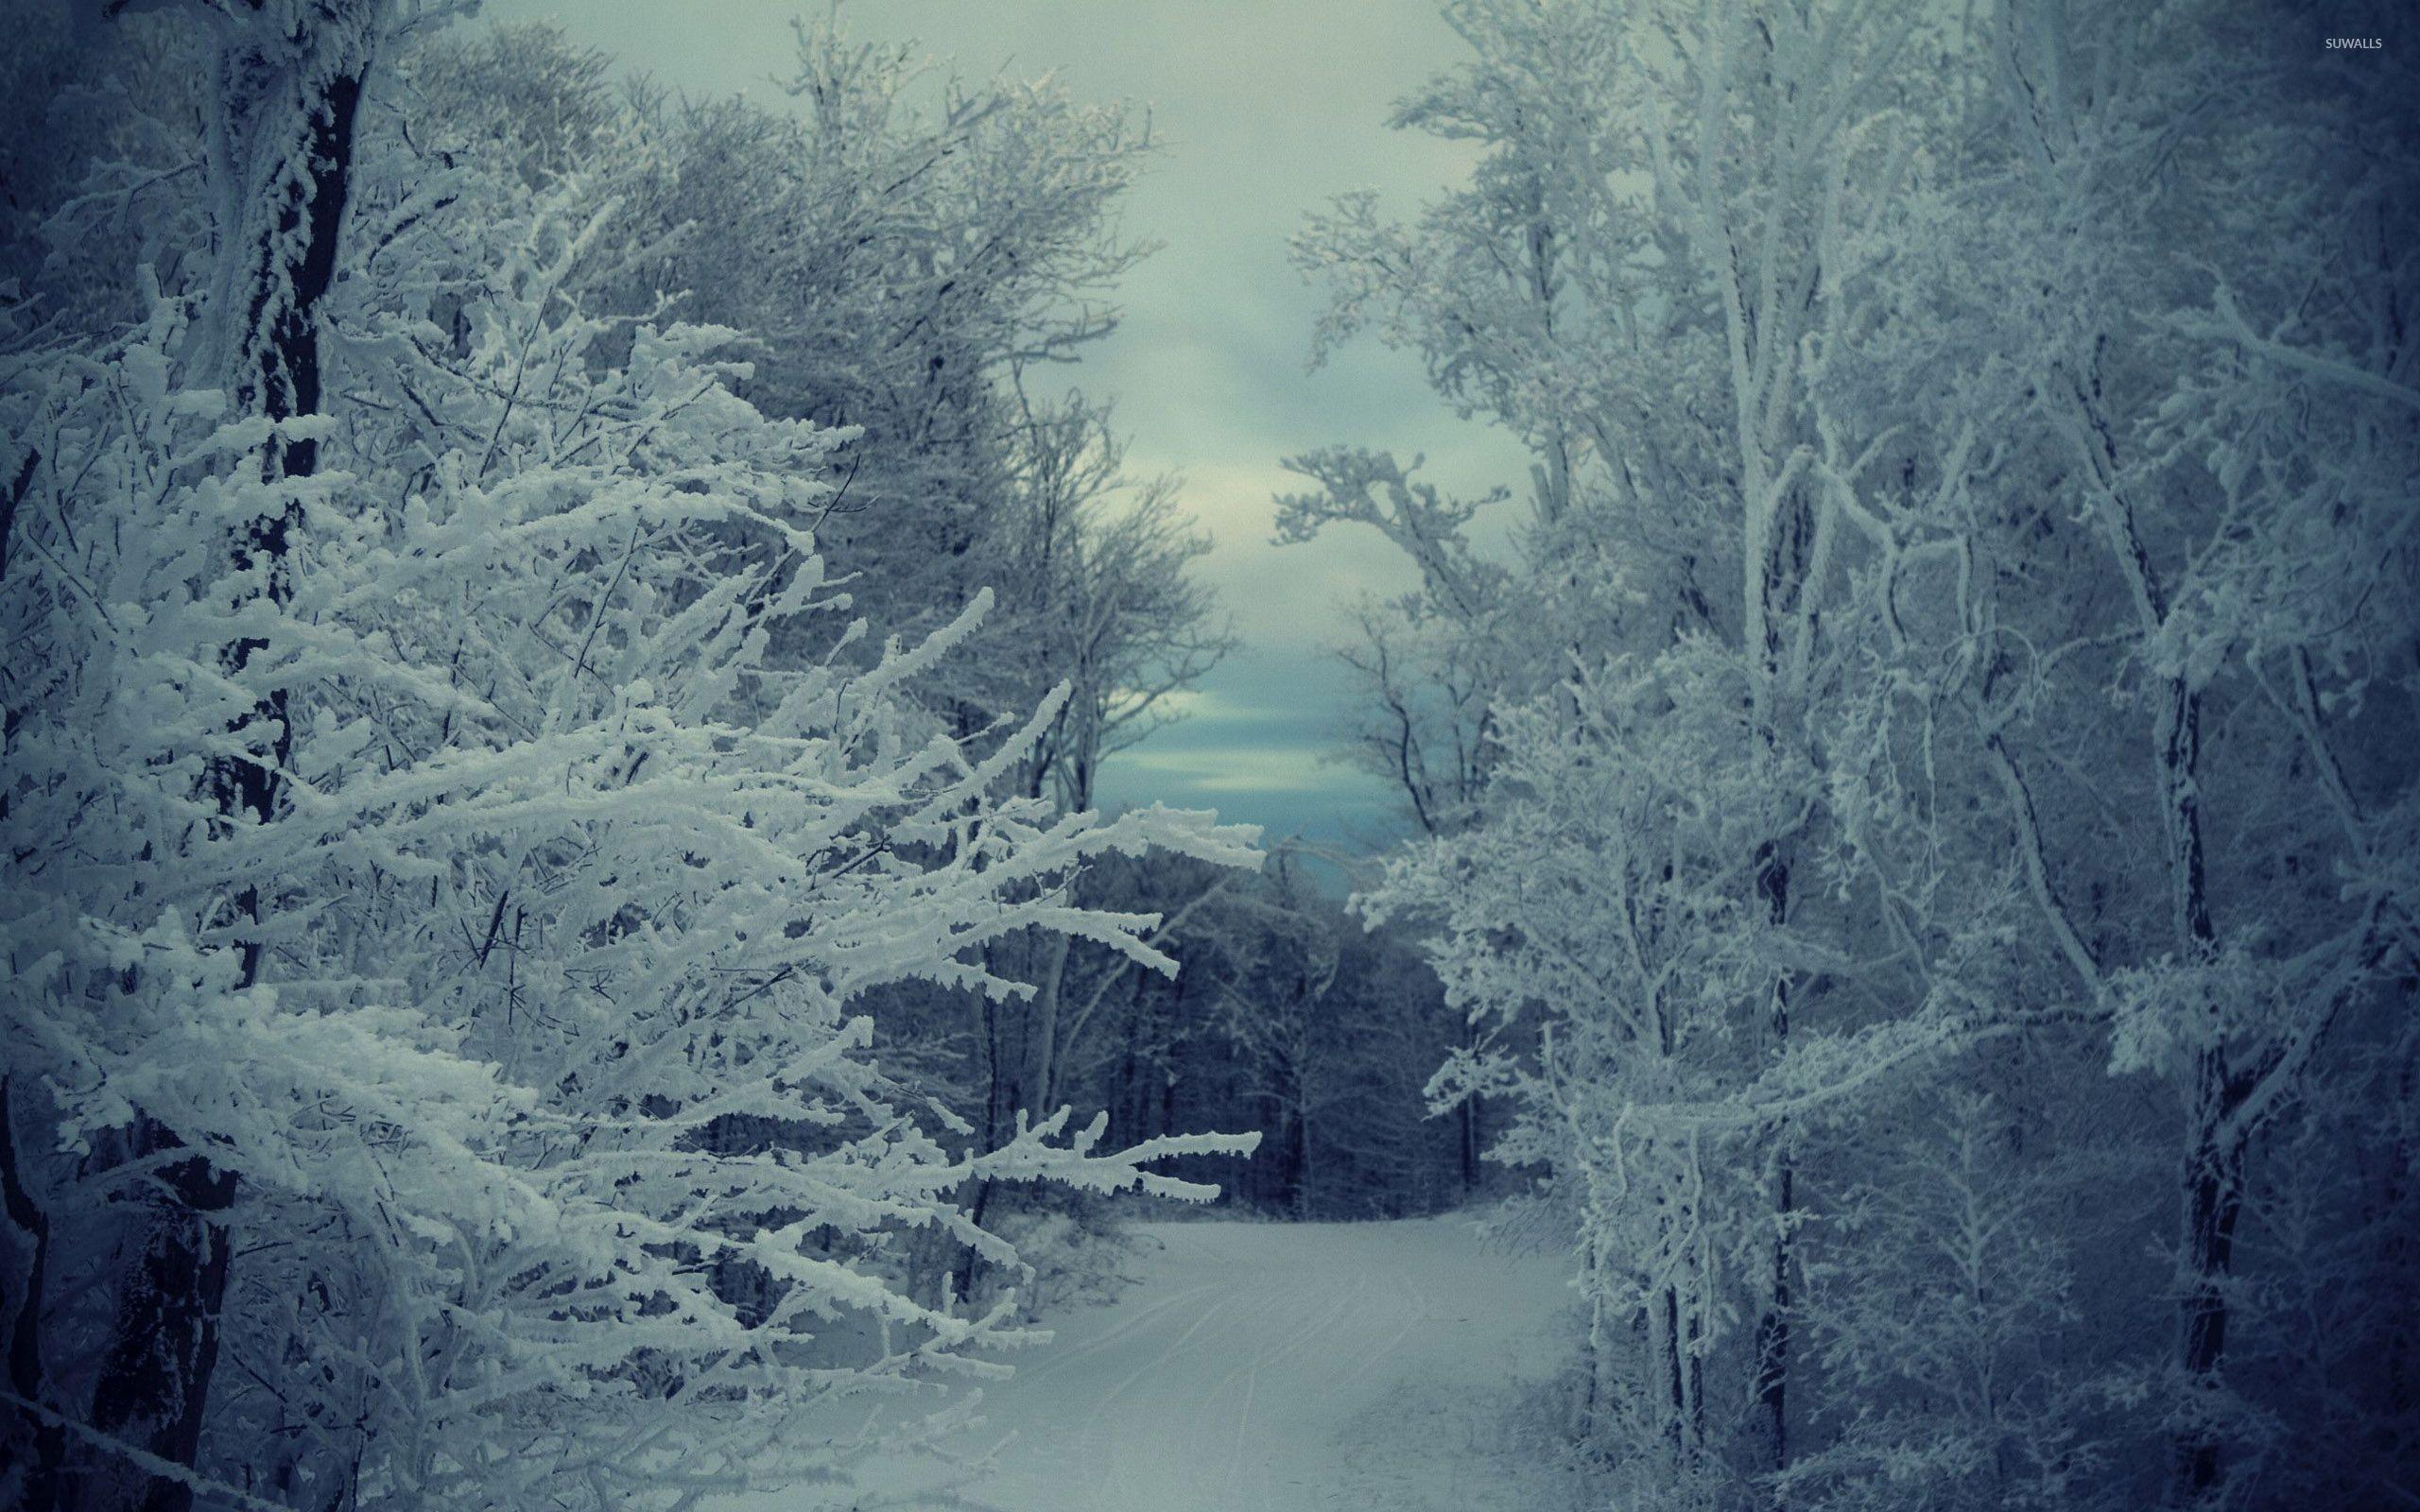 Path through the snowy forest wallpaper jpg